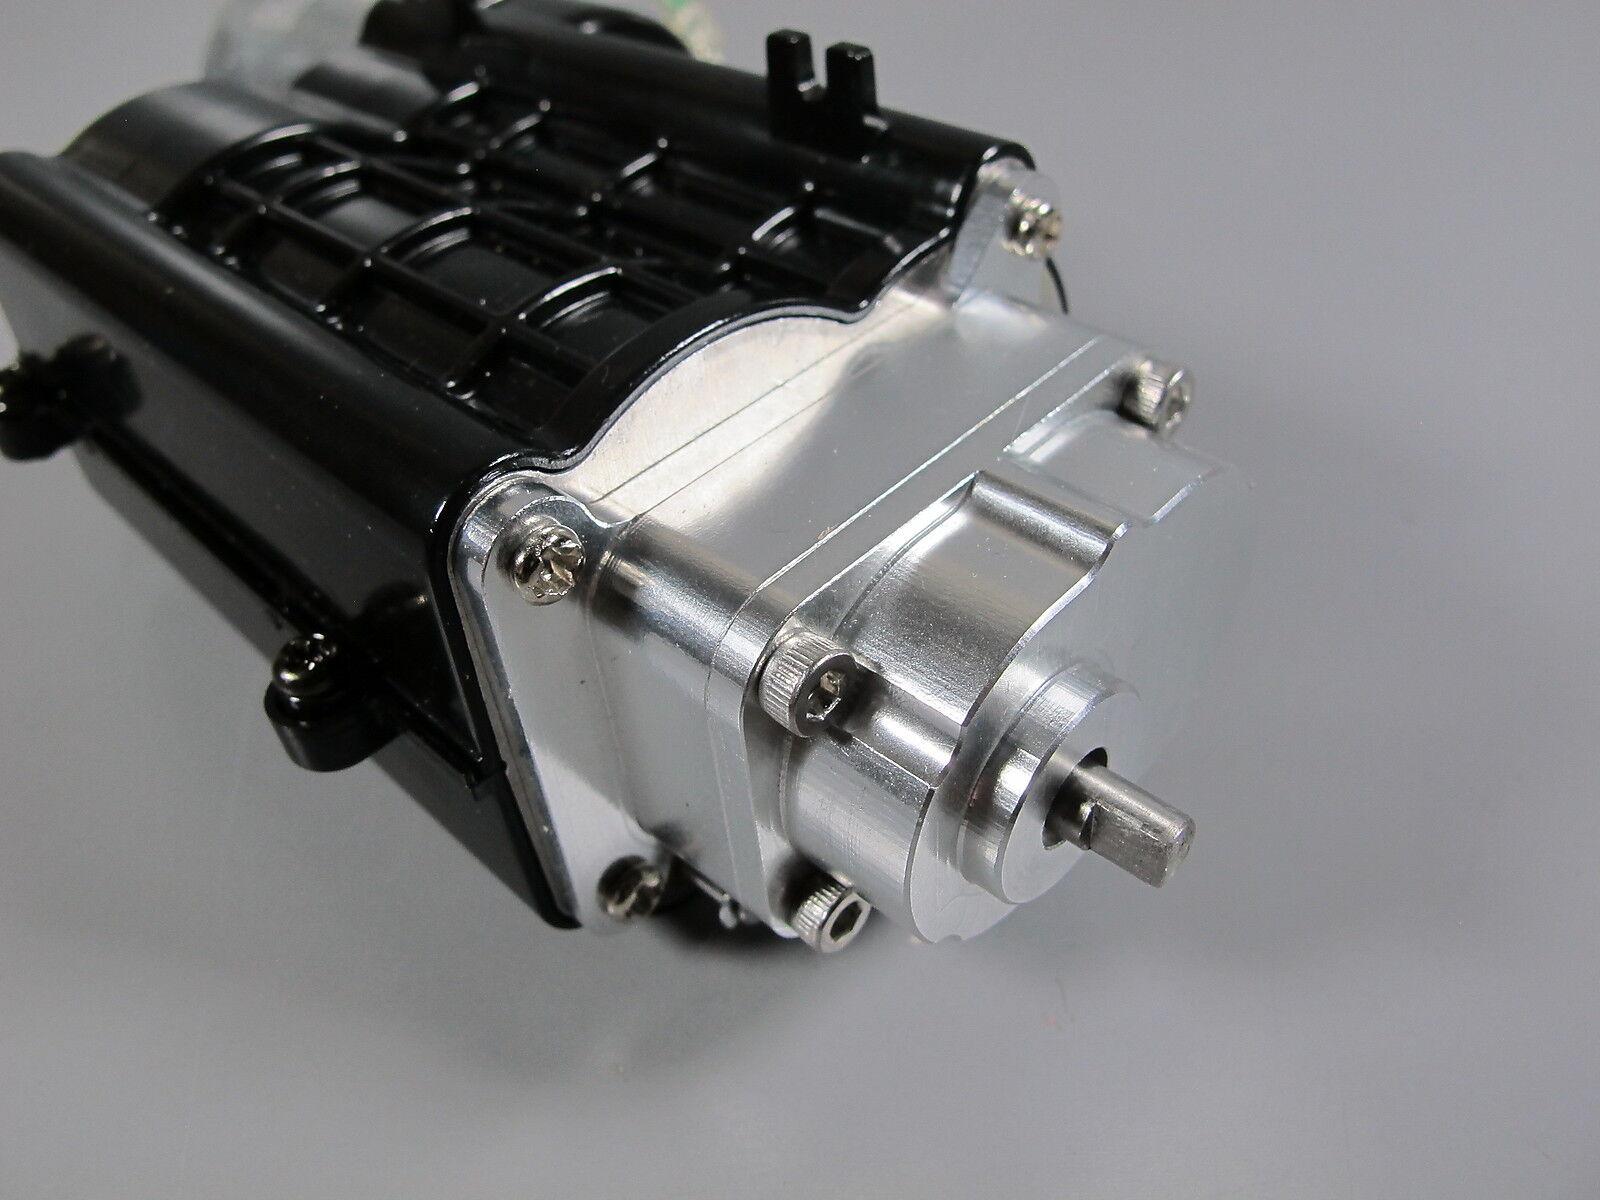 Add-On Add-On Add-On Speed Gear rossouction 4 1 Transmission Tamiya 1 14 re Gre Hauler uomo 01bcd4